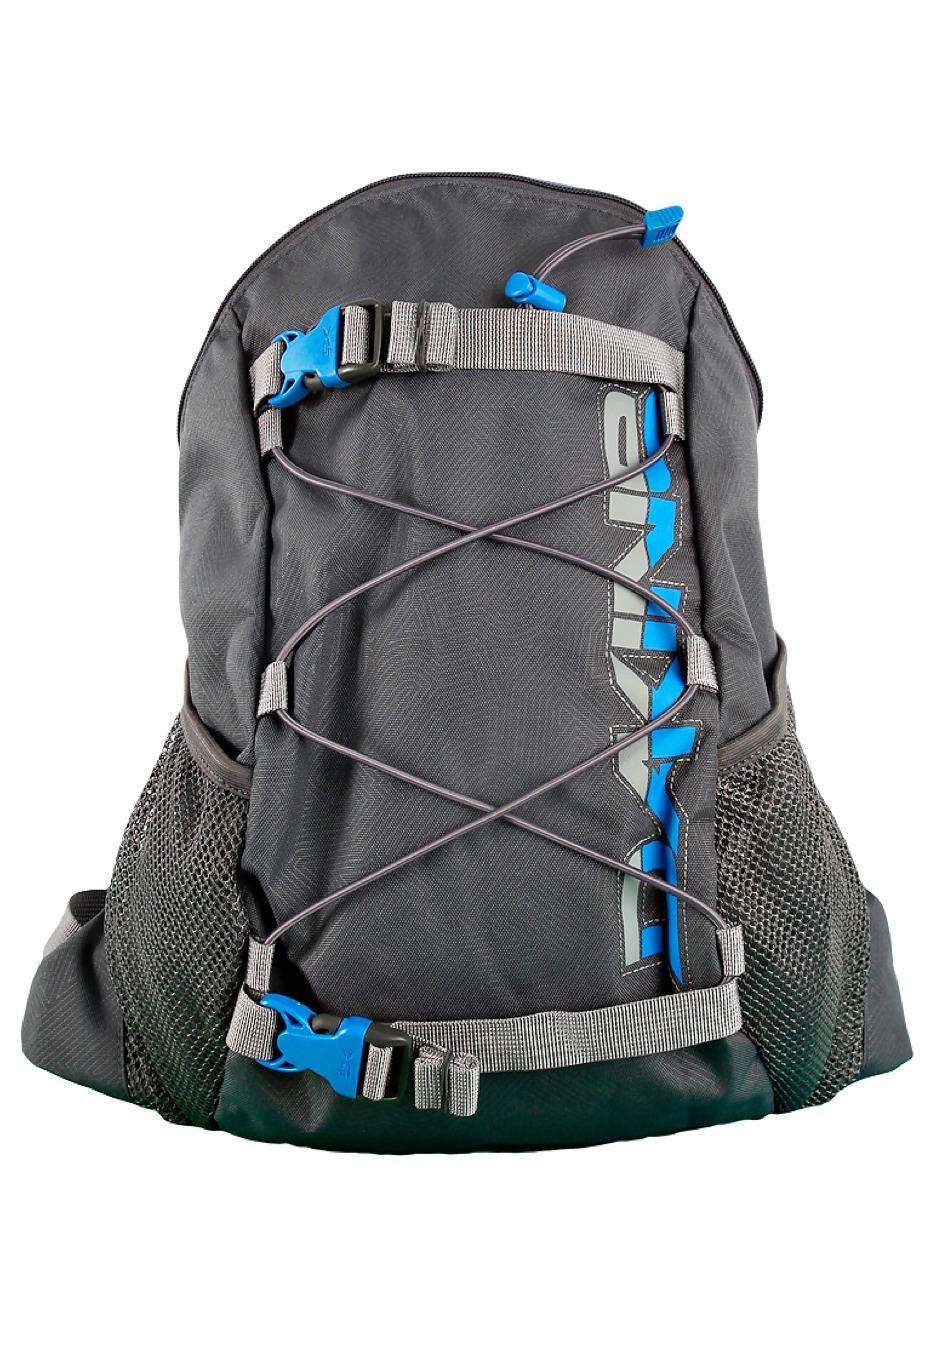 Dakine - Wonder Pack Stencil - Backpack - Impericon.com Worldwide